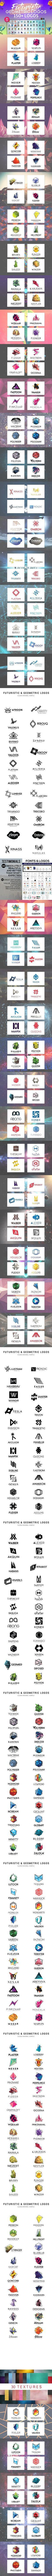 Futuristic & Geometric Branding Logo. Logo Templates